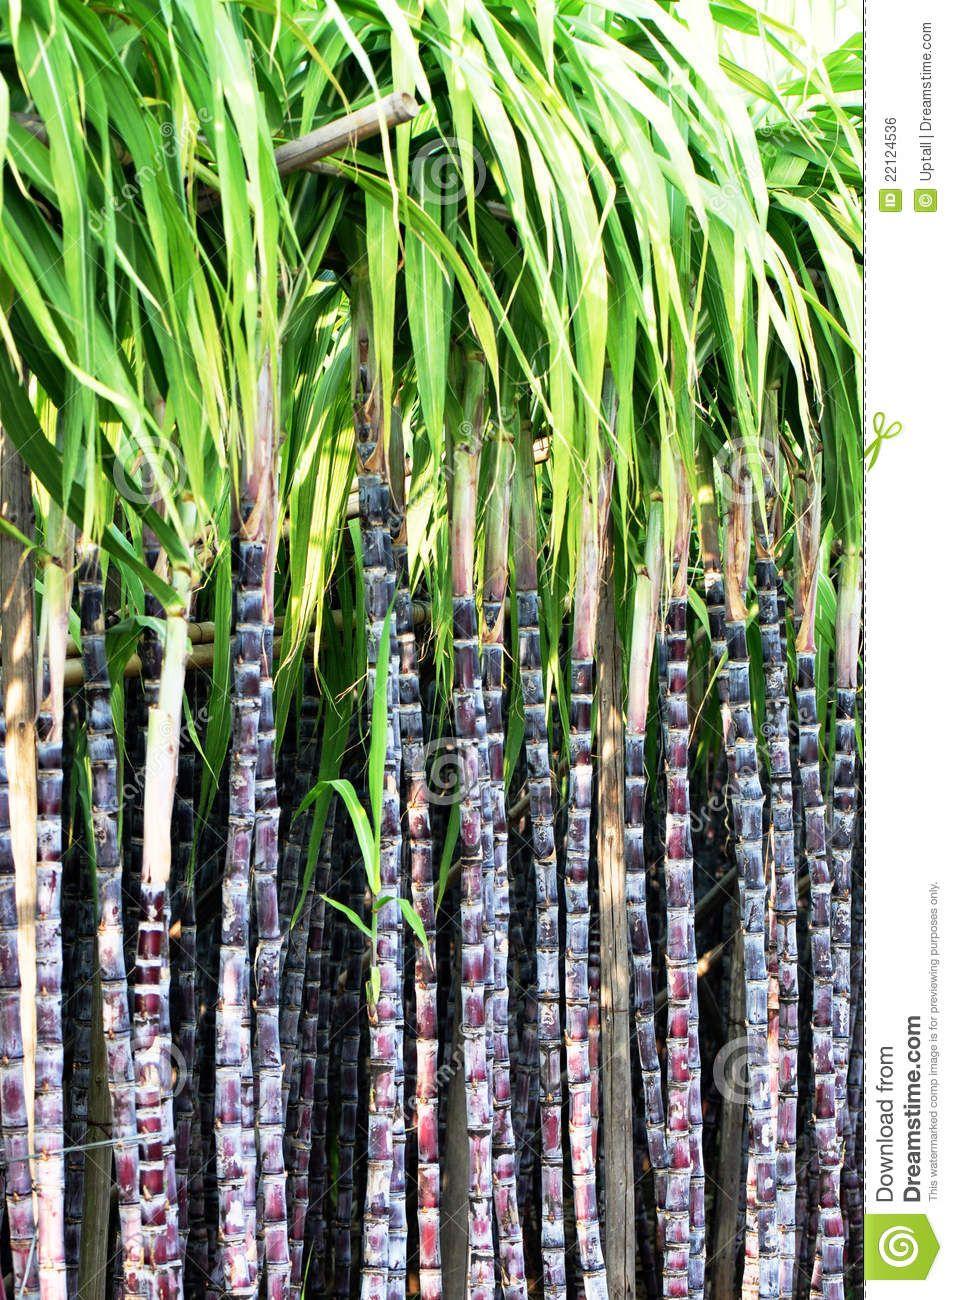 Black Sugarcane Stalks Sugarcane Image Sugarcane Sugar Cane Plant